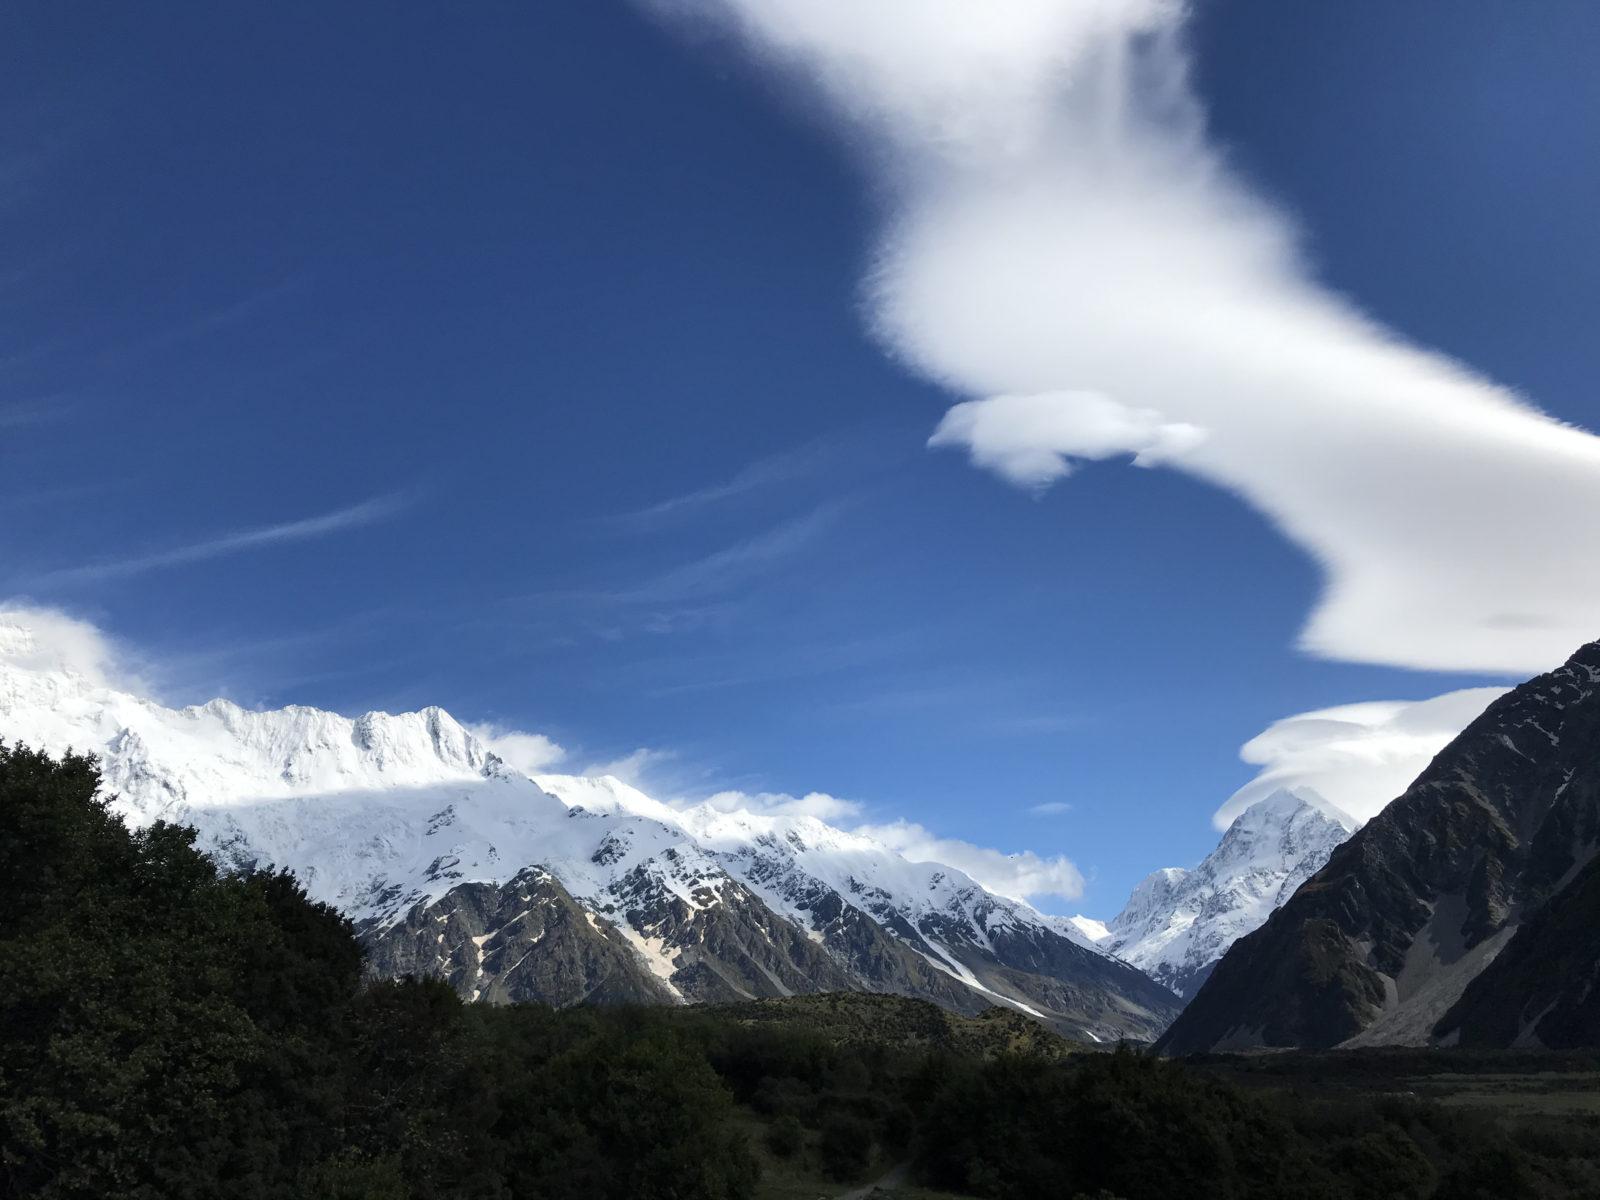 NZの政治&経済は、風通しよくて気持ちよし(ニュージーランド4/6)